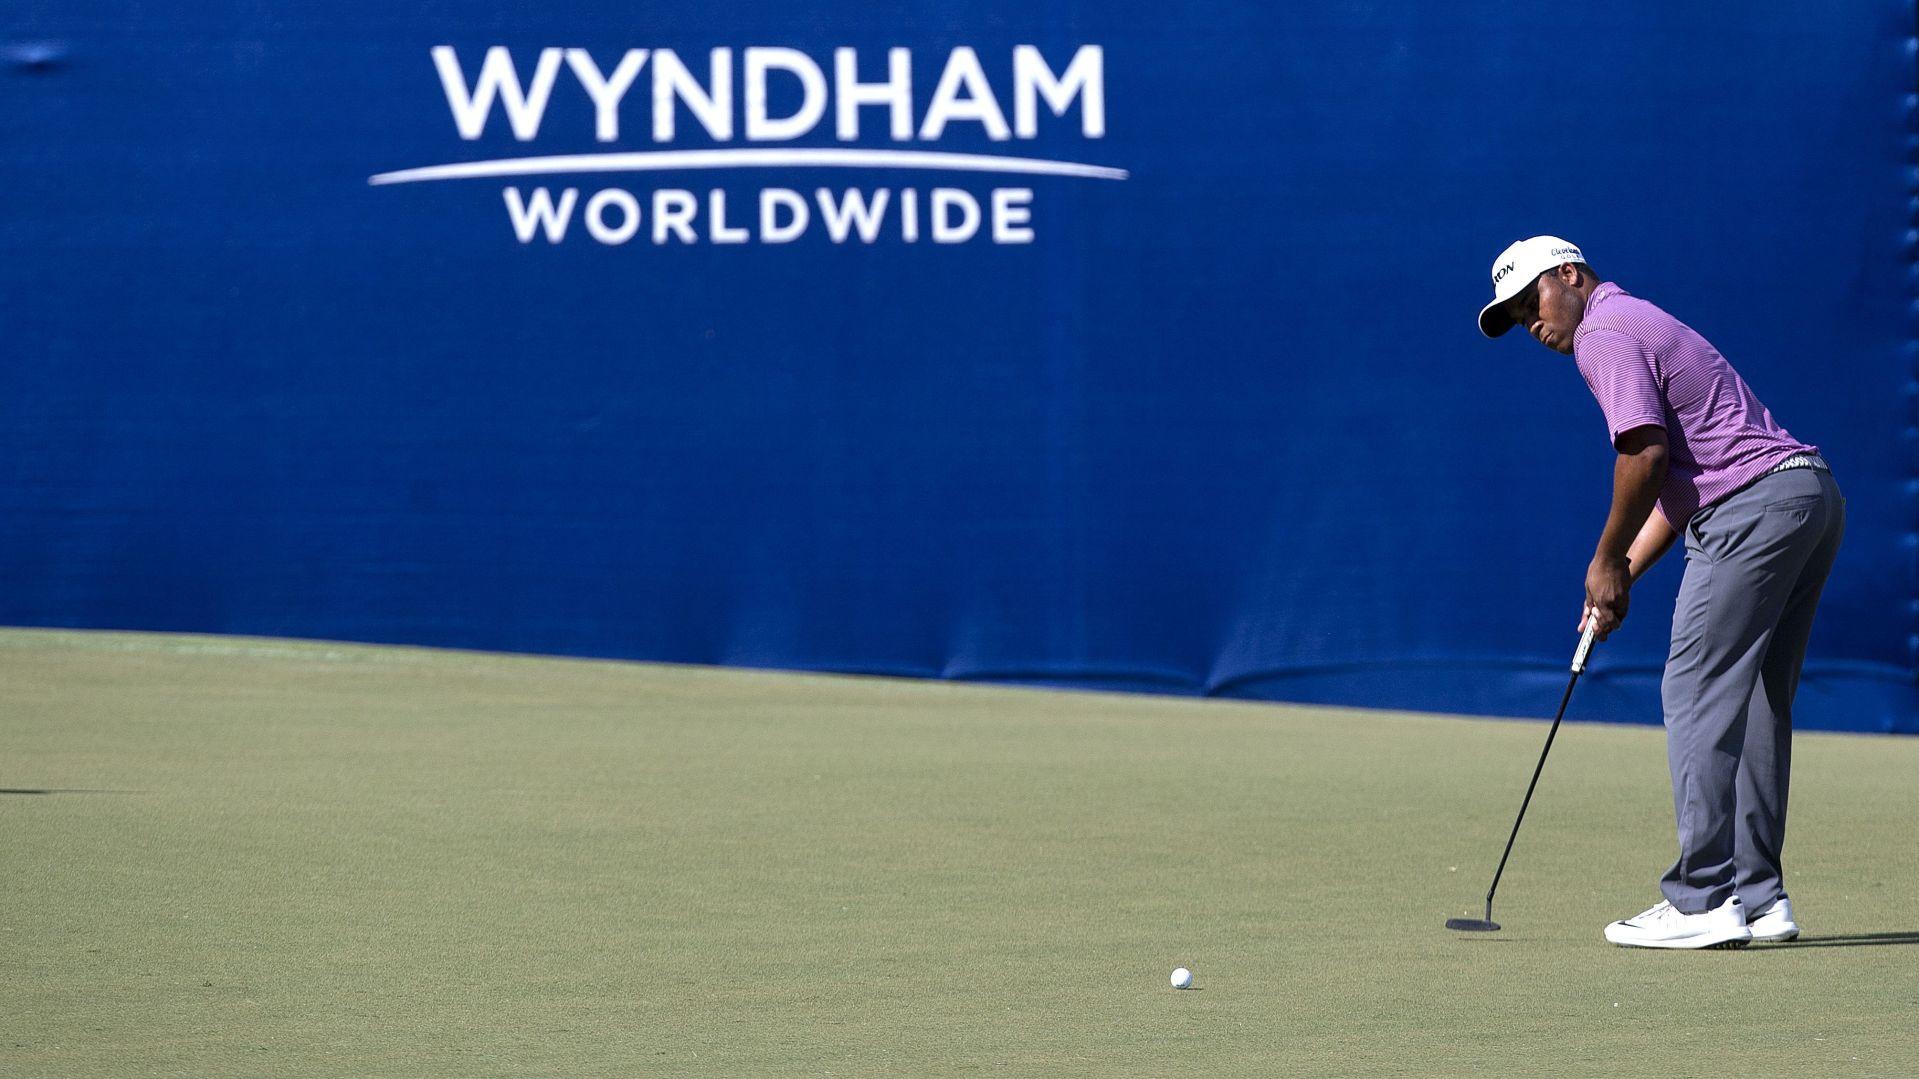 Henrik Stenson captures sixth PGA Tour win at Wyndham Championship